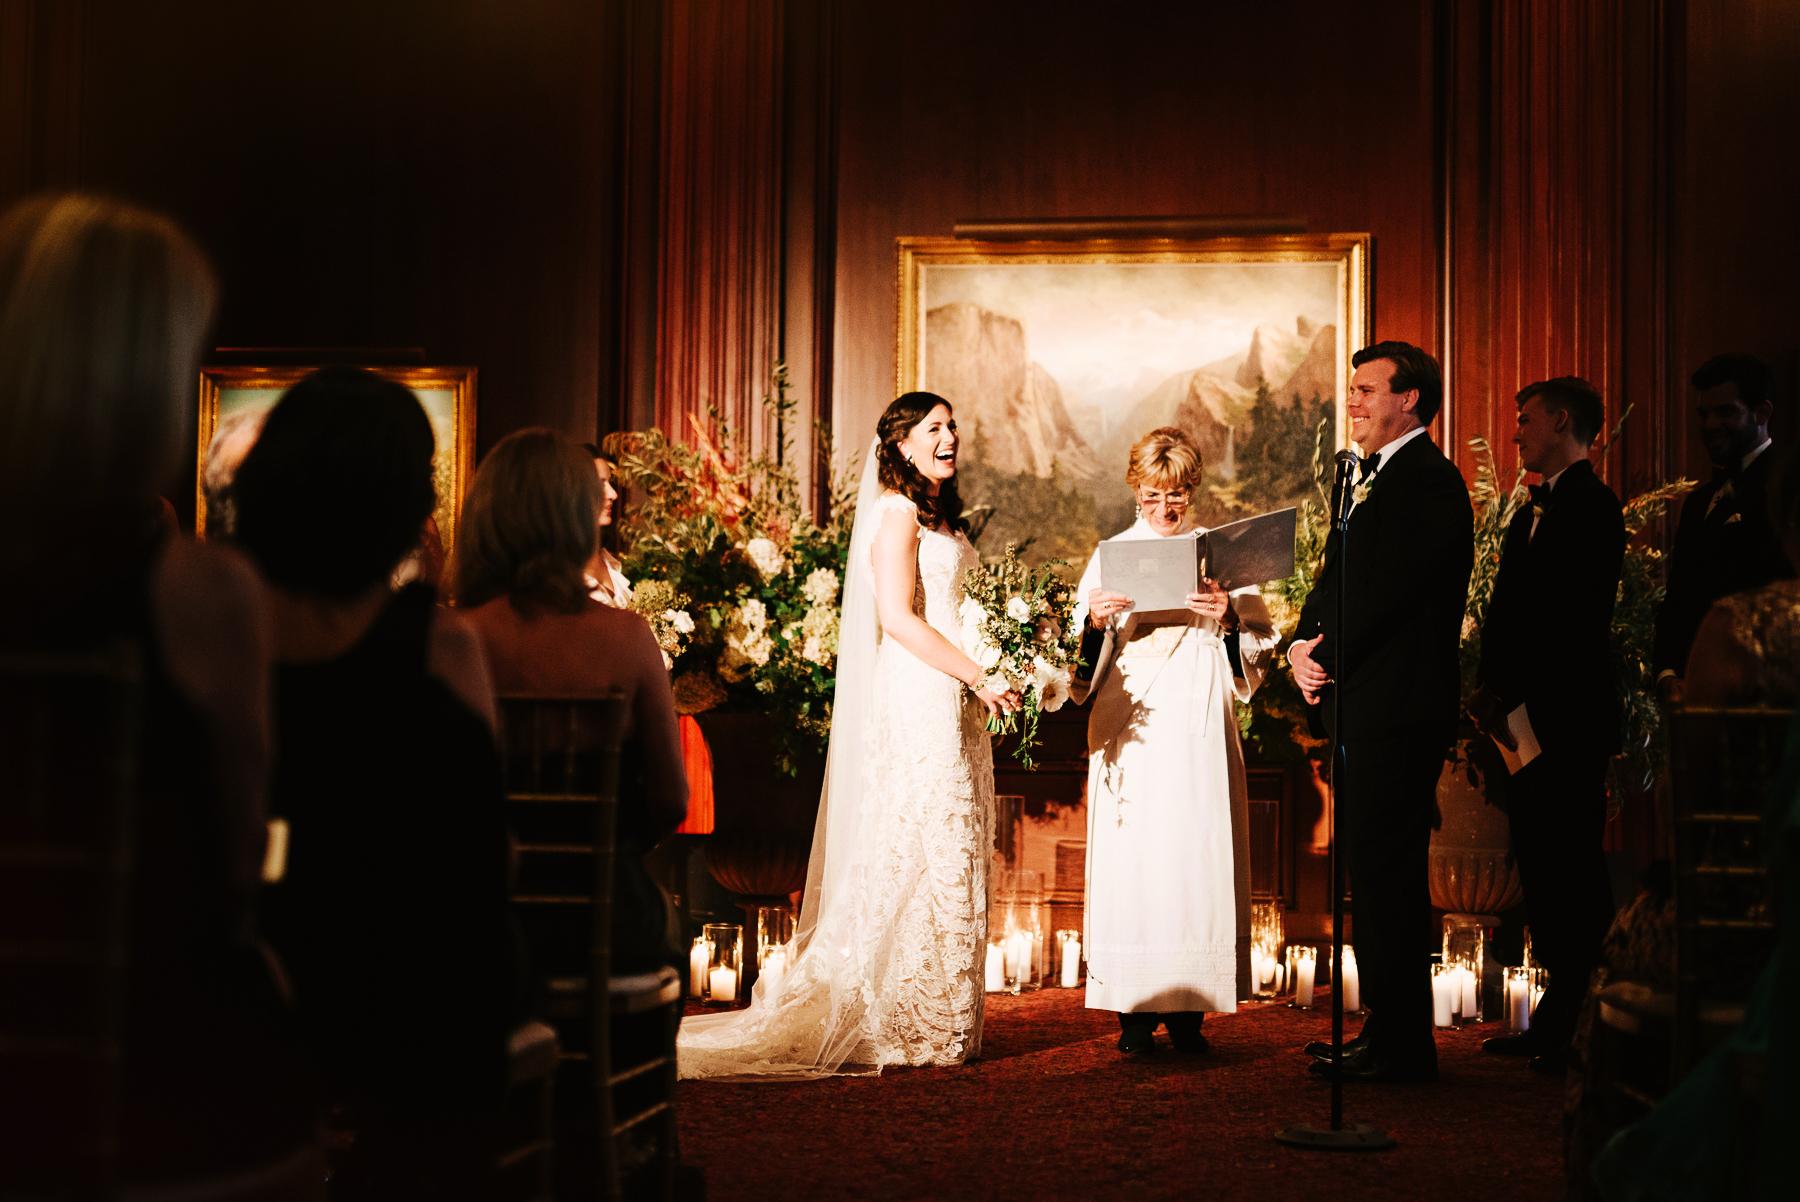 San francisco wedding photography pat furey photography for San francisco wedding photography